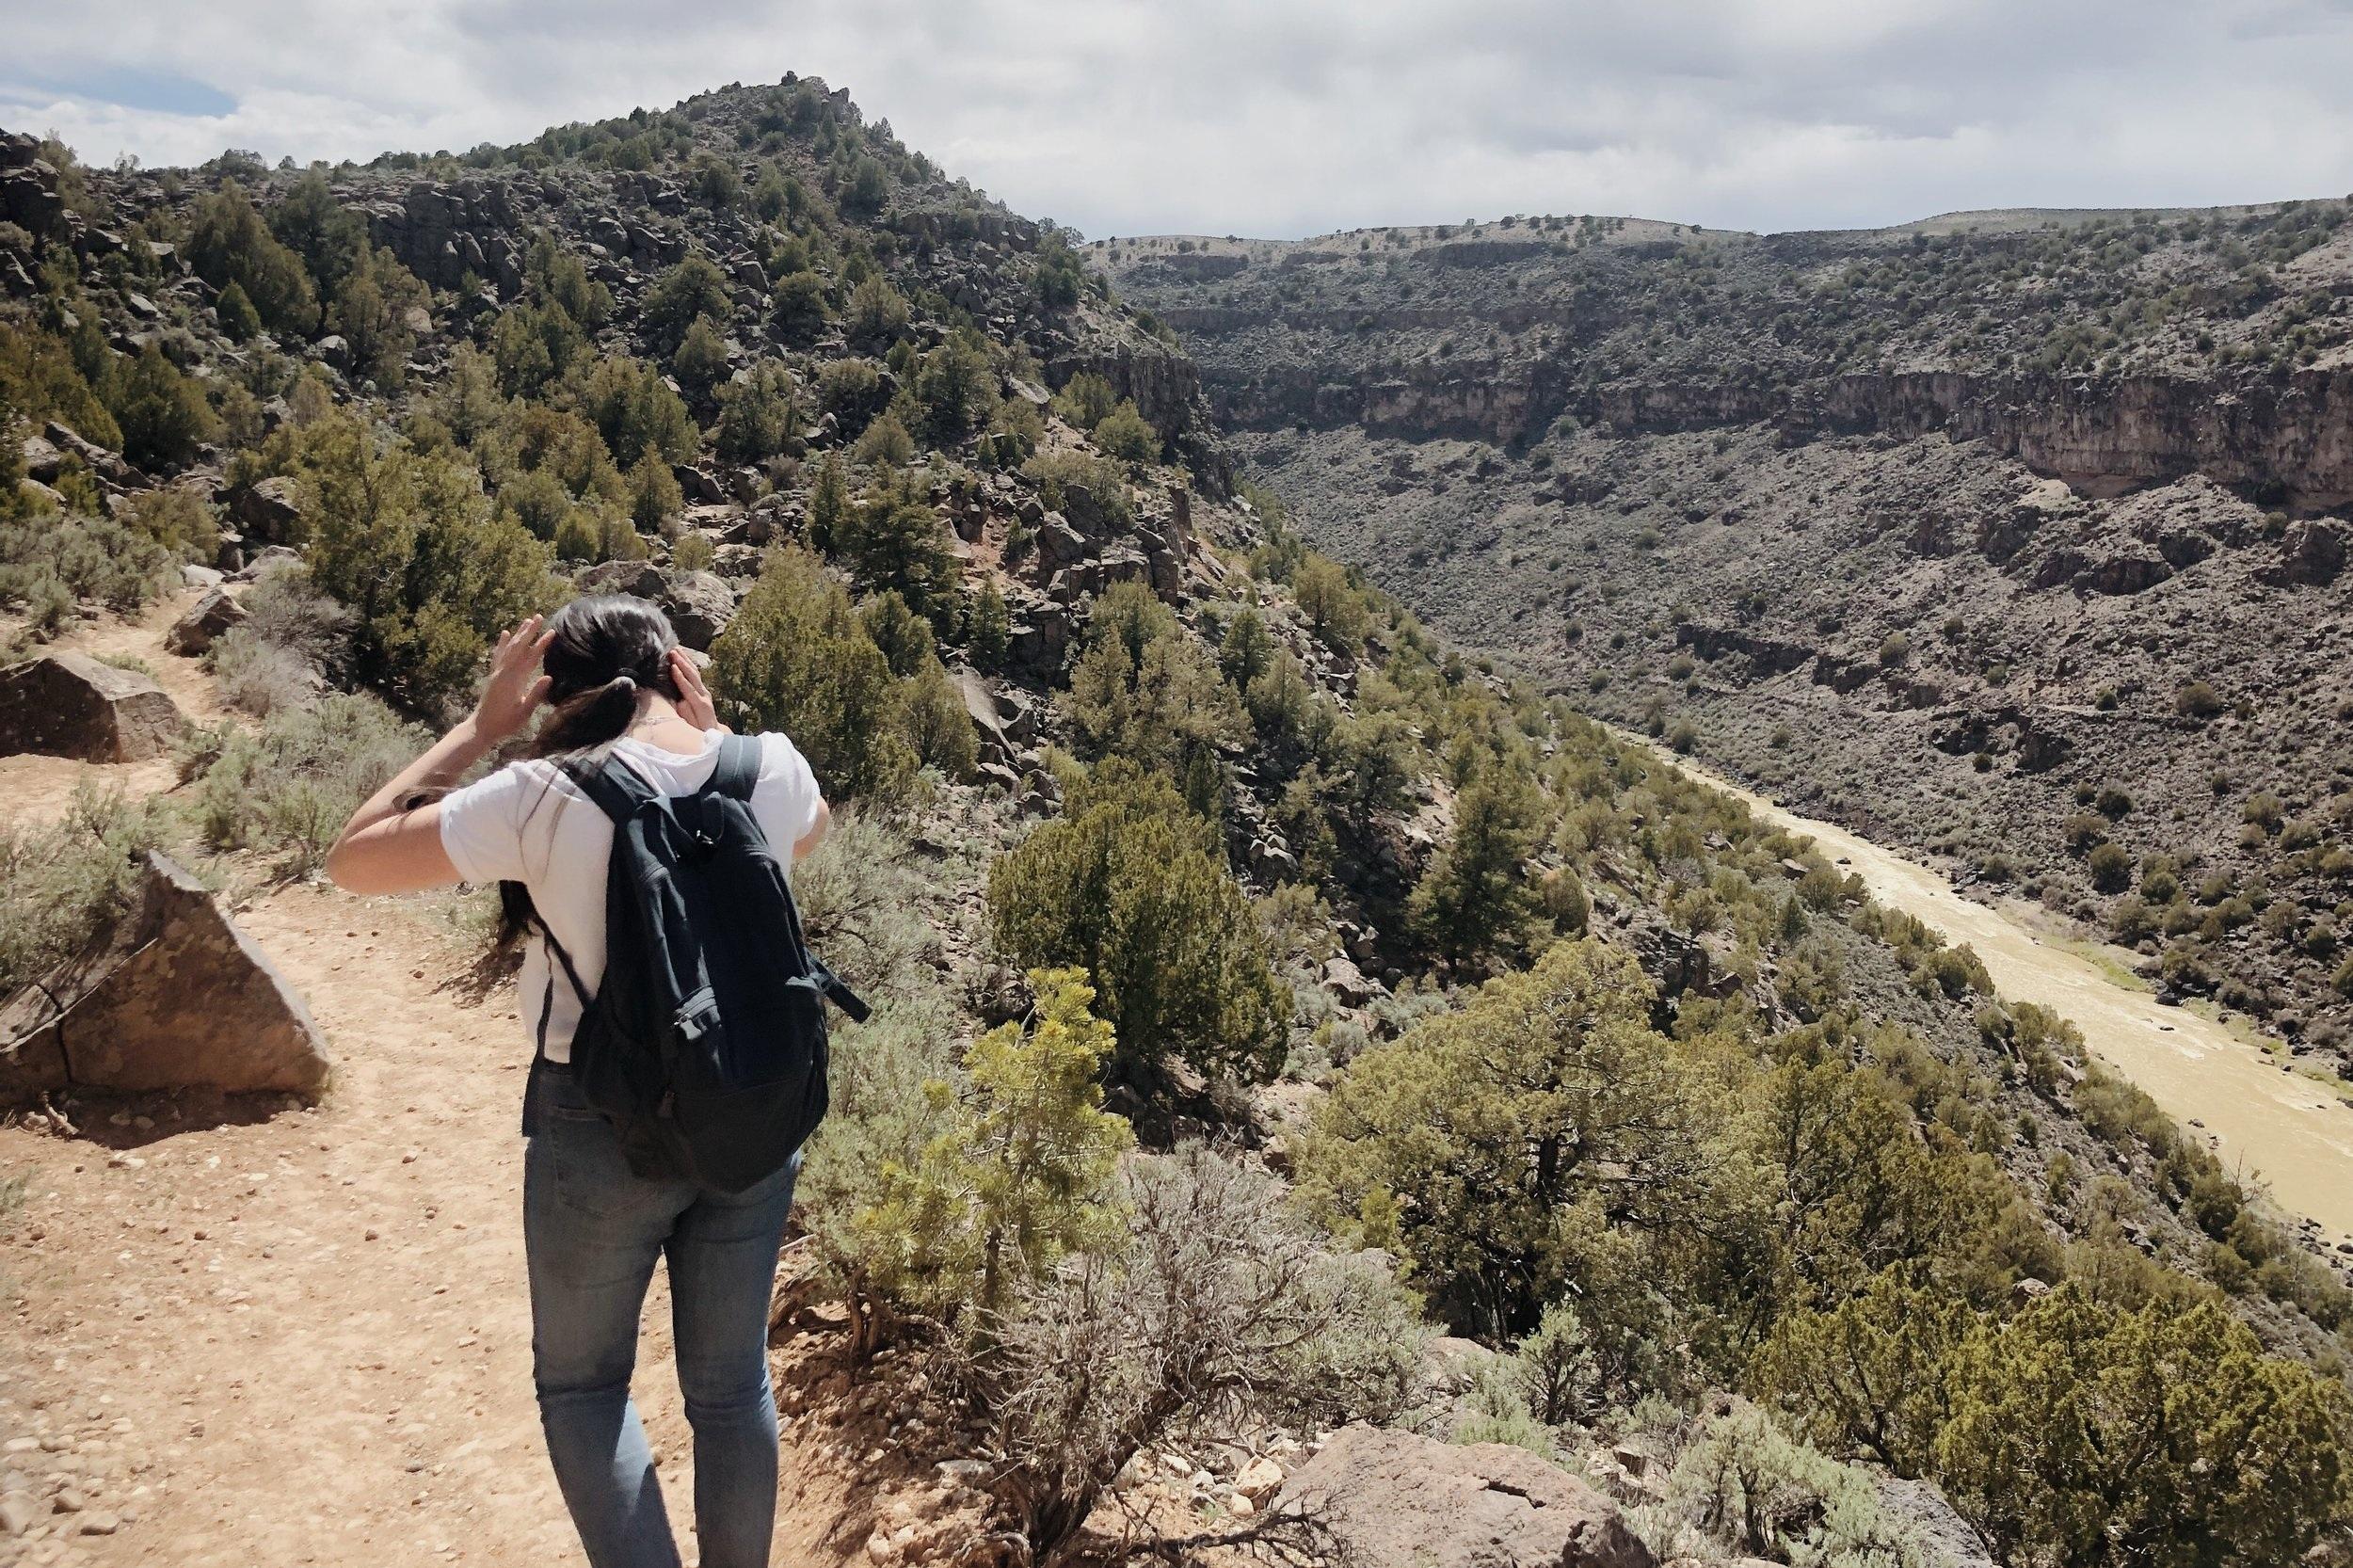 Hiking in the Rio Grande Gorge.